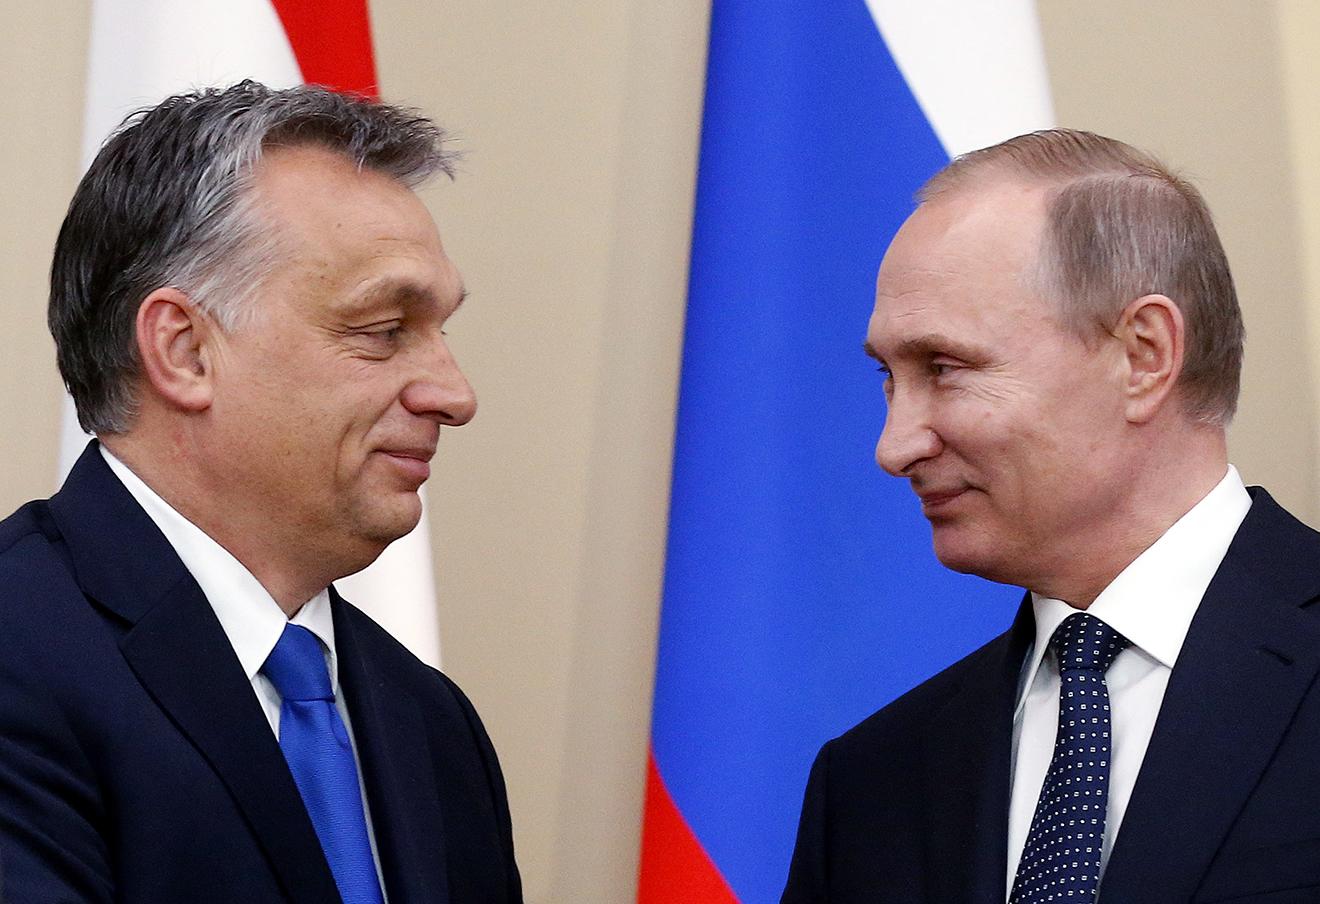 Виктор Орбан и Владимир Путин. Фото: Максим Шипенков / AP